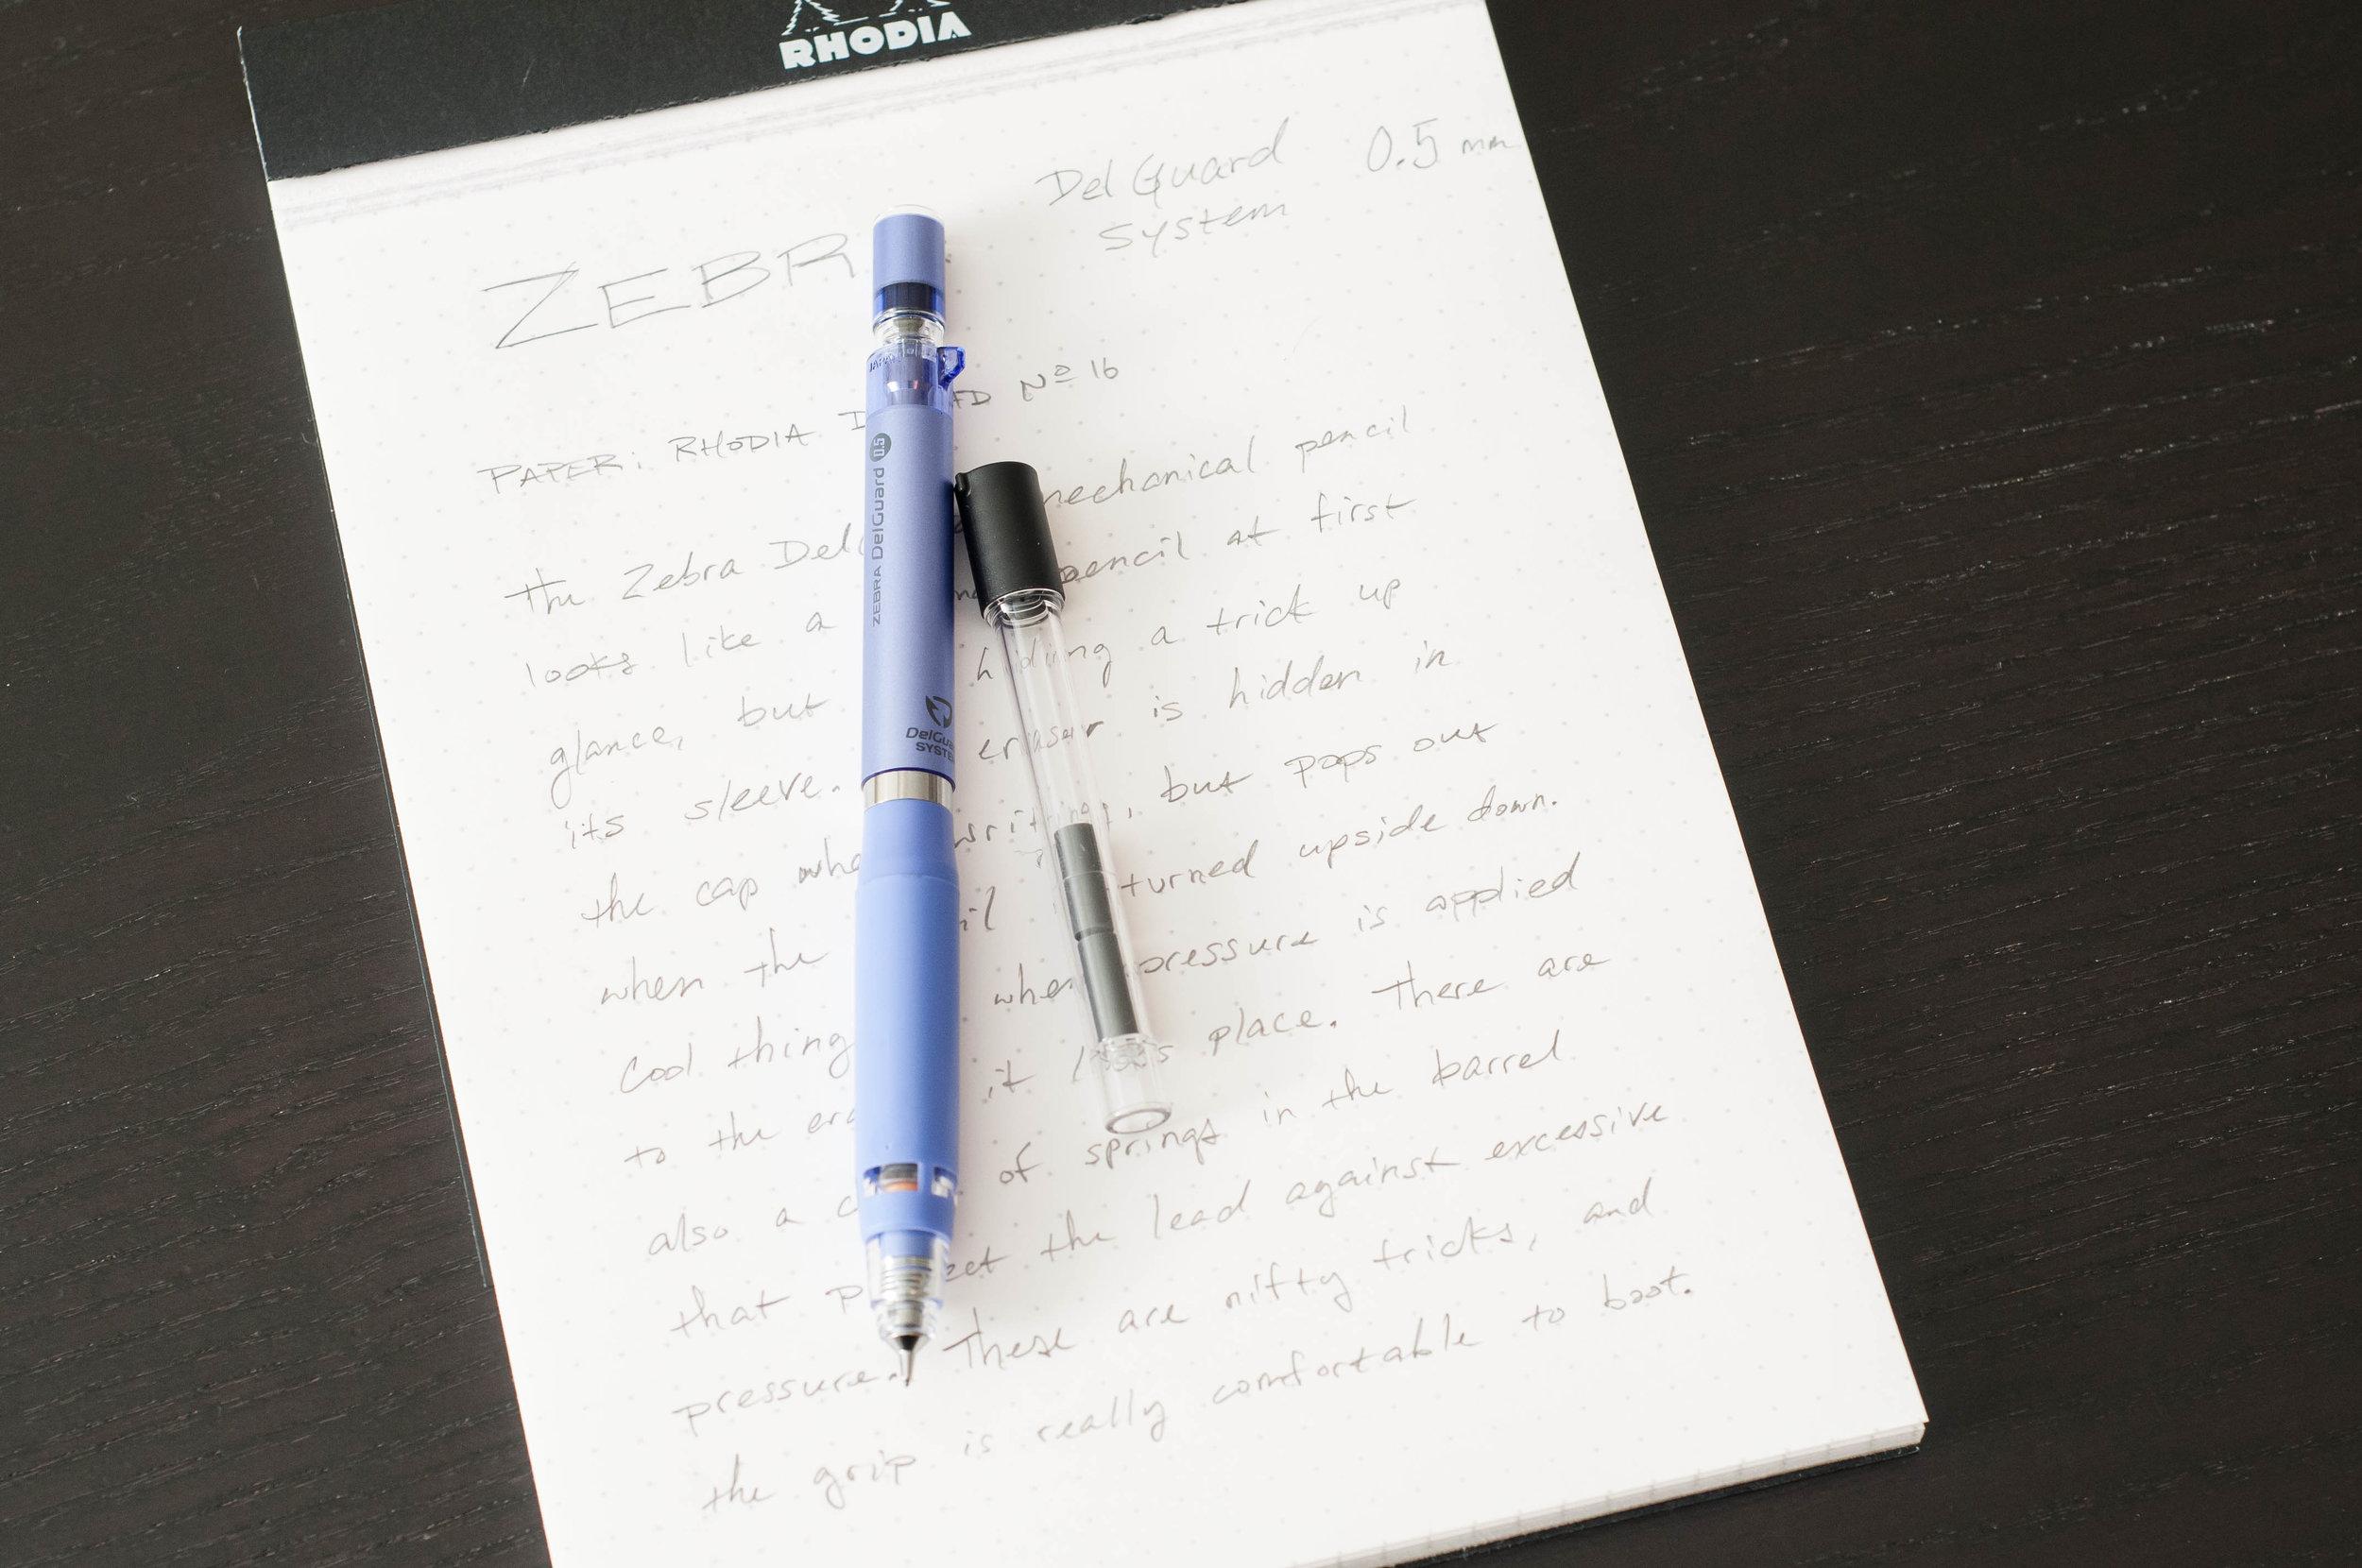 zebra delguard type er mechanical pencil review the pen addict